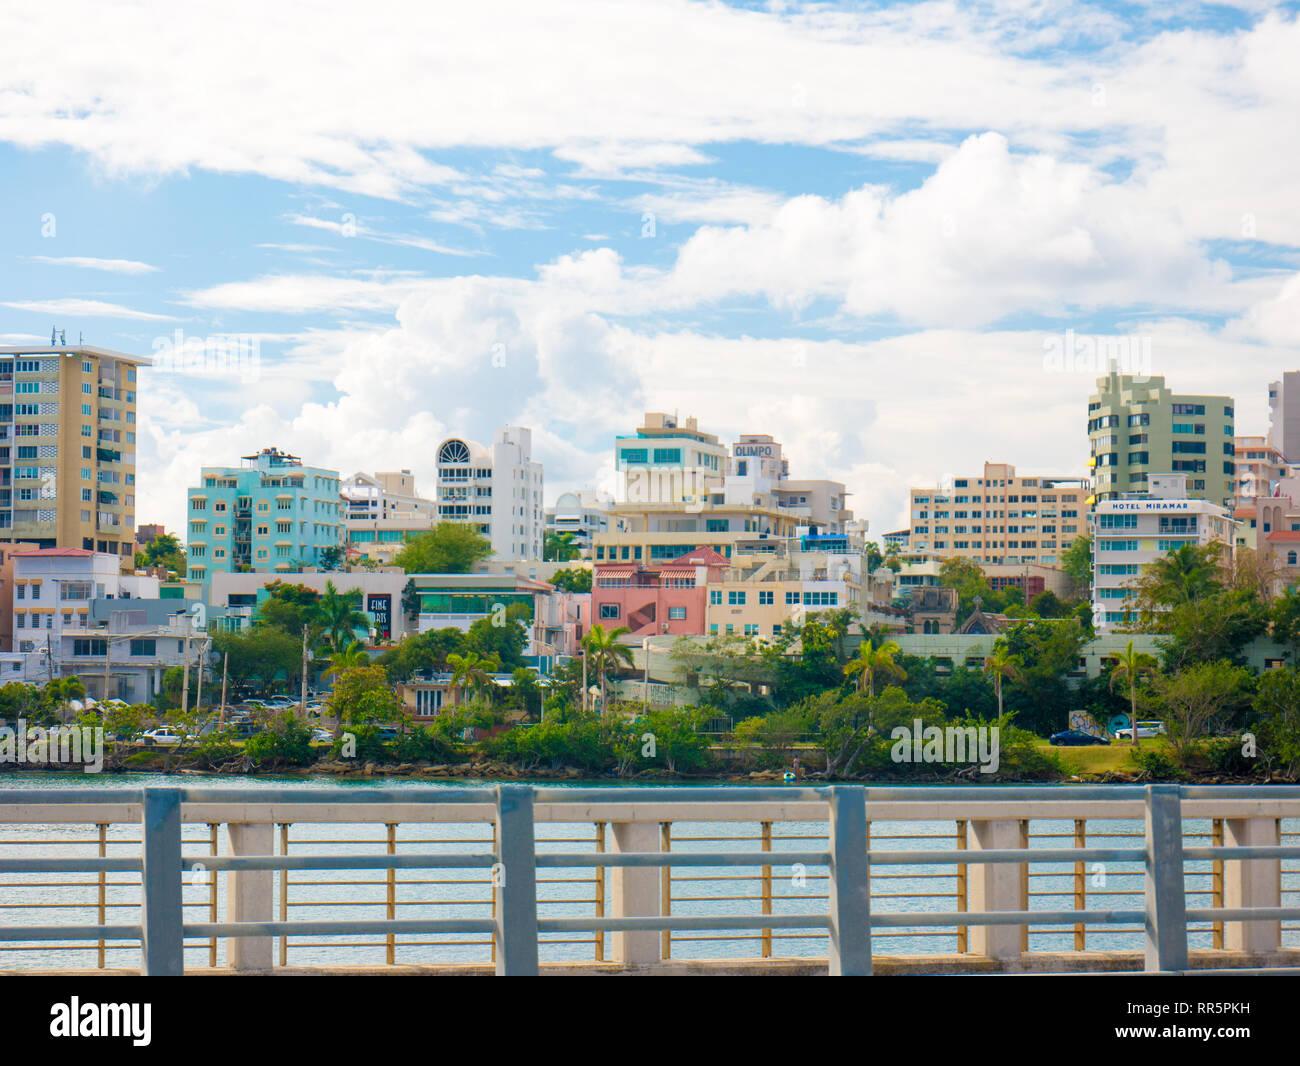 San Juan, Puerto Rico. January 2019. View of San JUan and Condado lagoon. Condado is a upper class community at east of the Old San Juan, Santurce, Sa - Stock Image